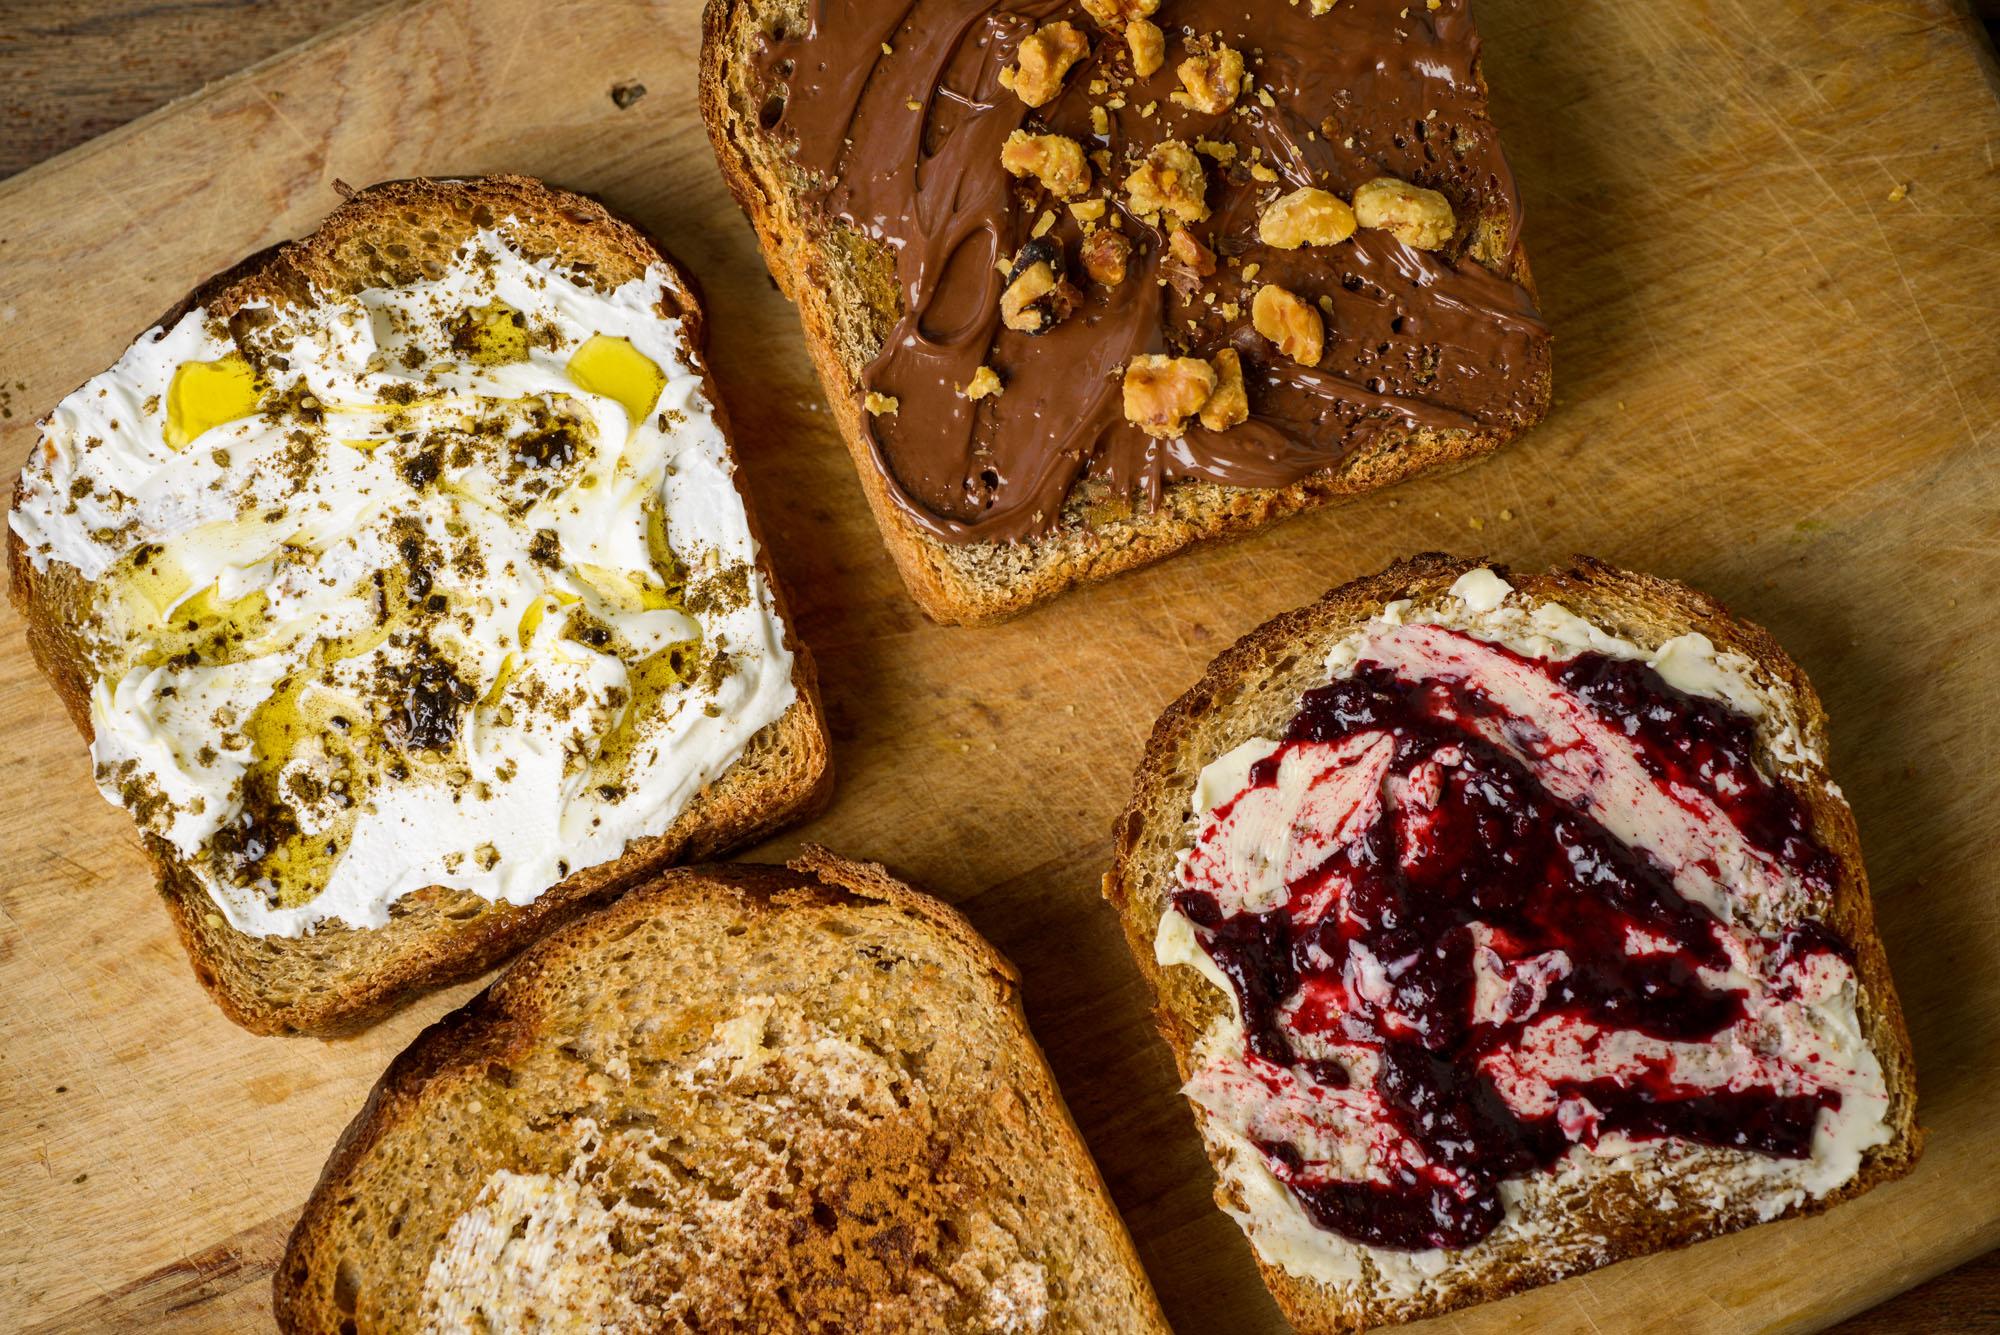 6731_d800b_Fraiche_Palo_Alto_Food_Photography.jpg